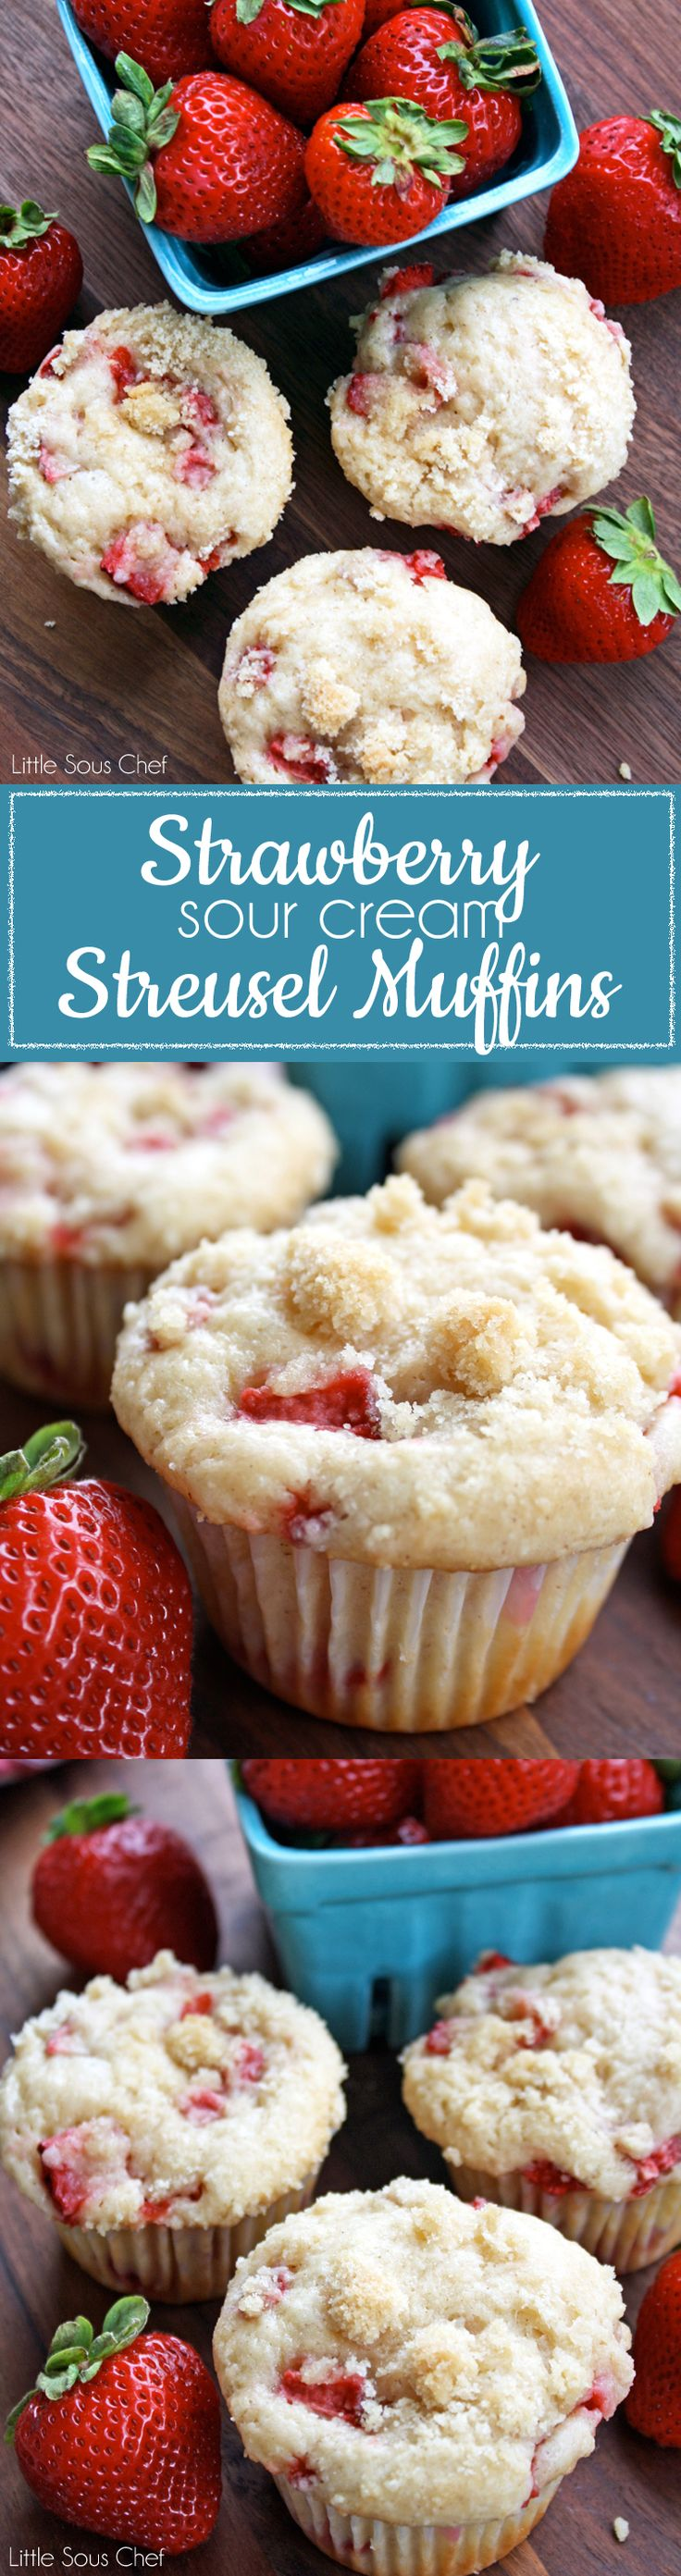 Strawberry Sour Cream Streusel Muffins